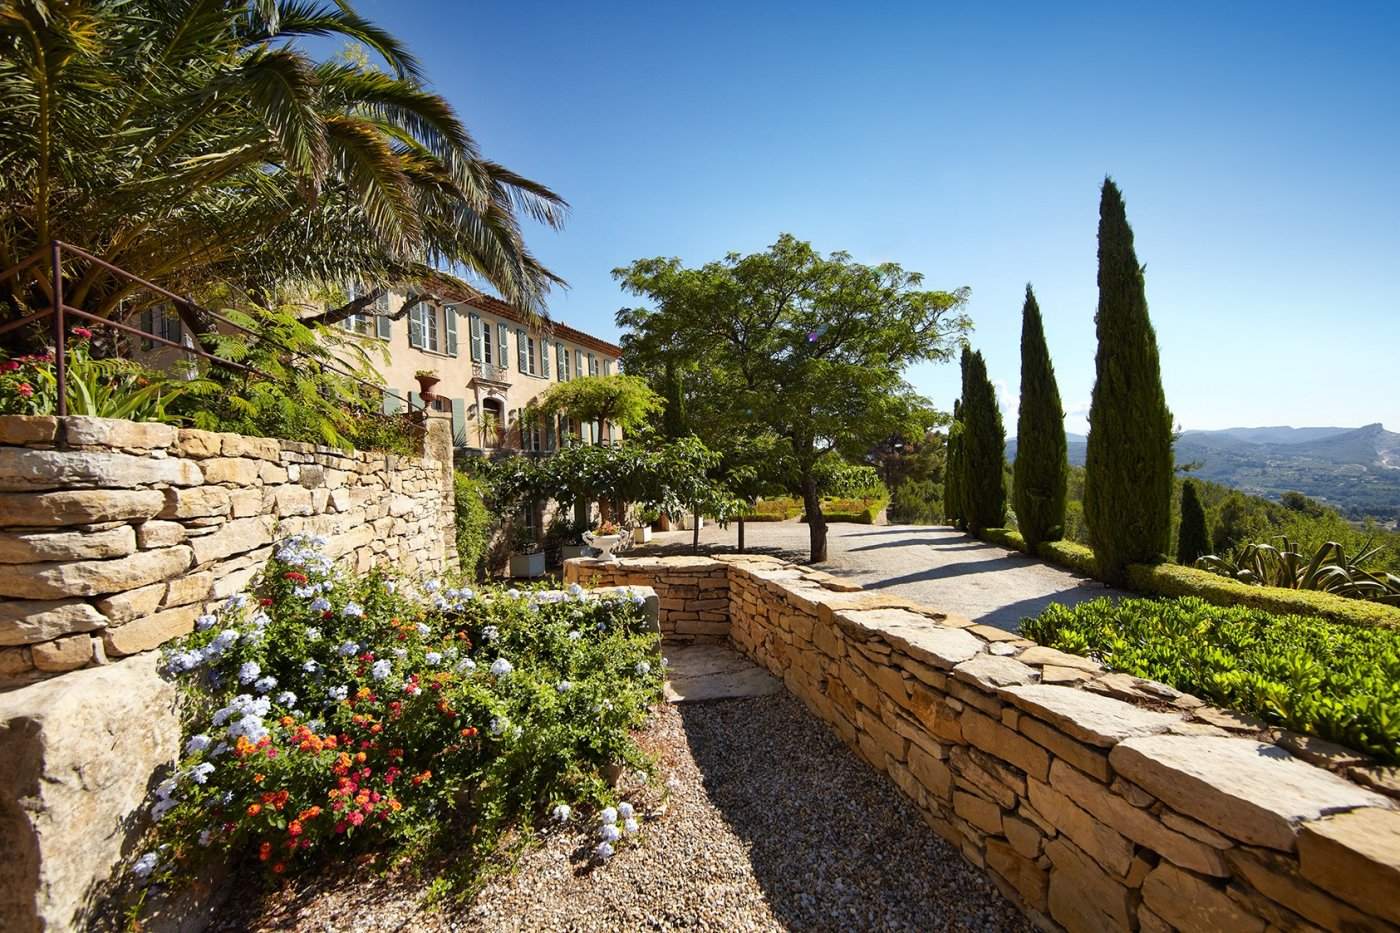 chateau-de-pibarnon-un-petit-paradis-provence